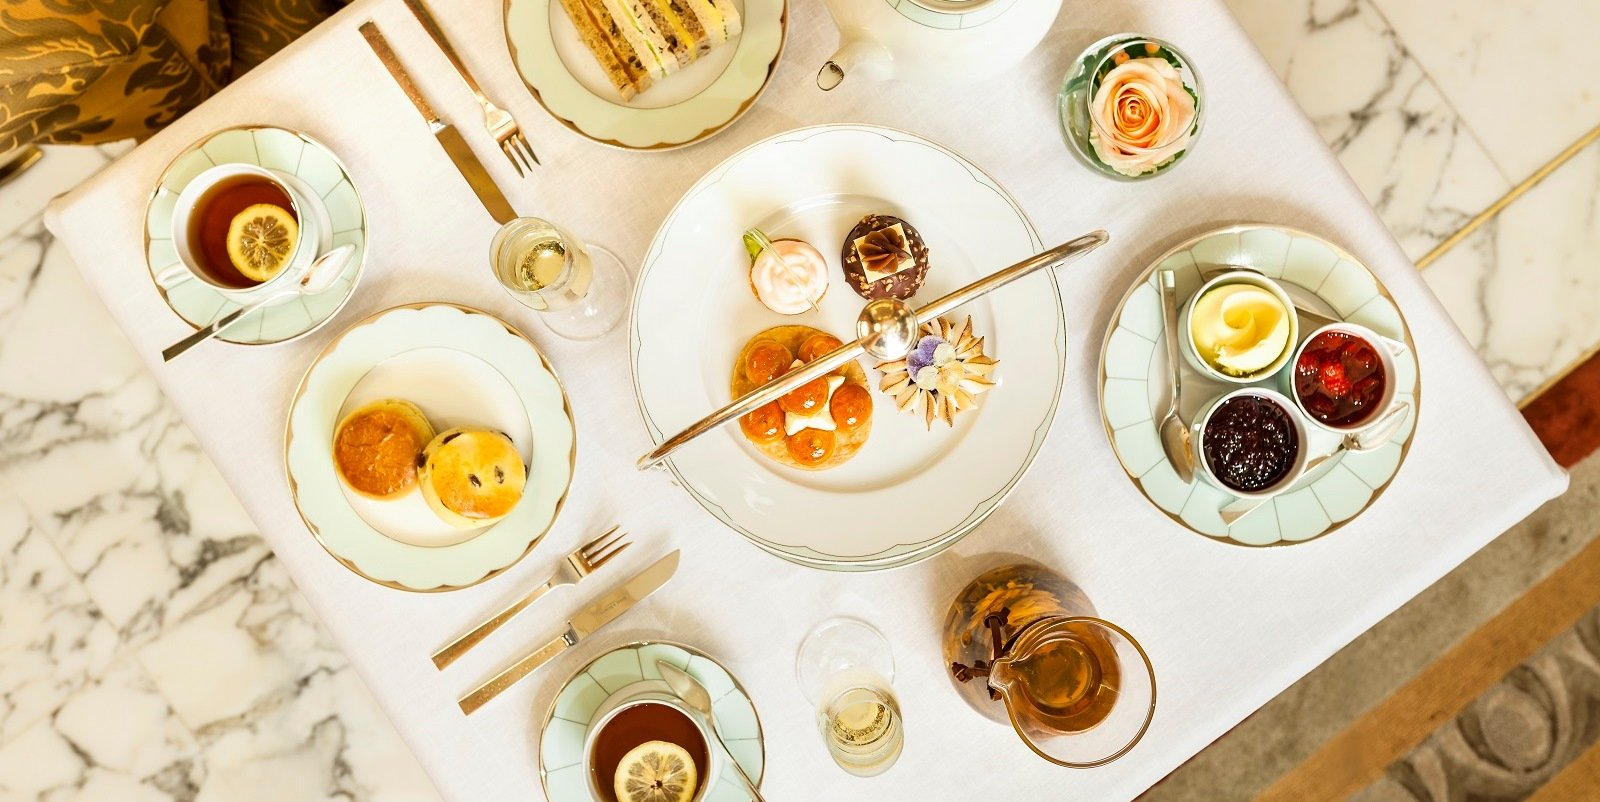 Hotel Eden The Dorchester Champagne Afternoon Tea